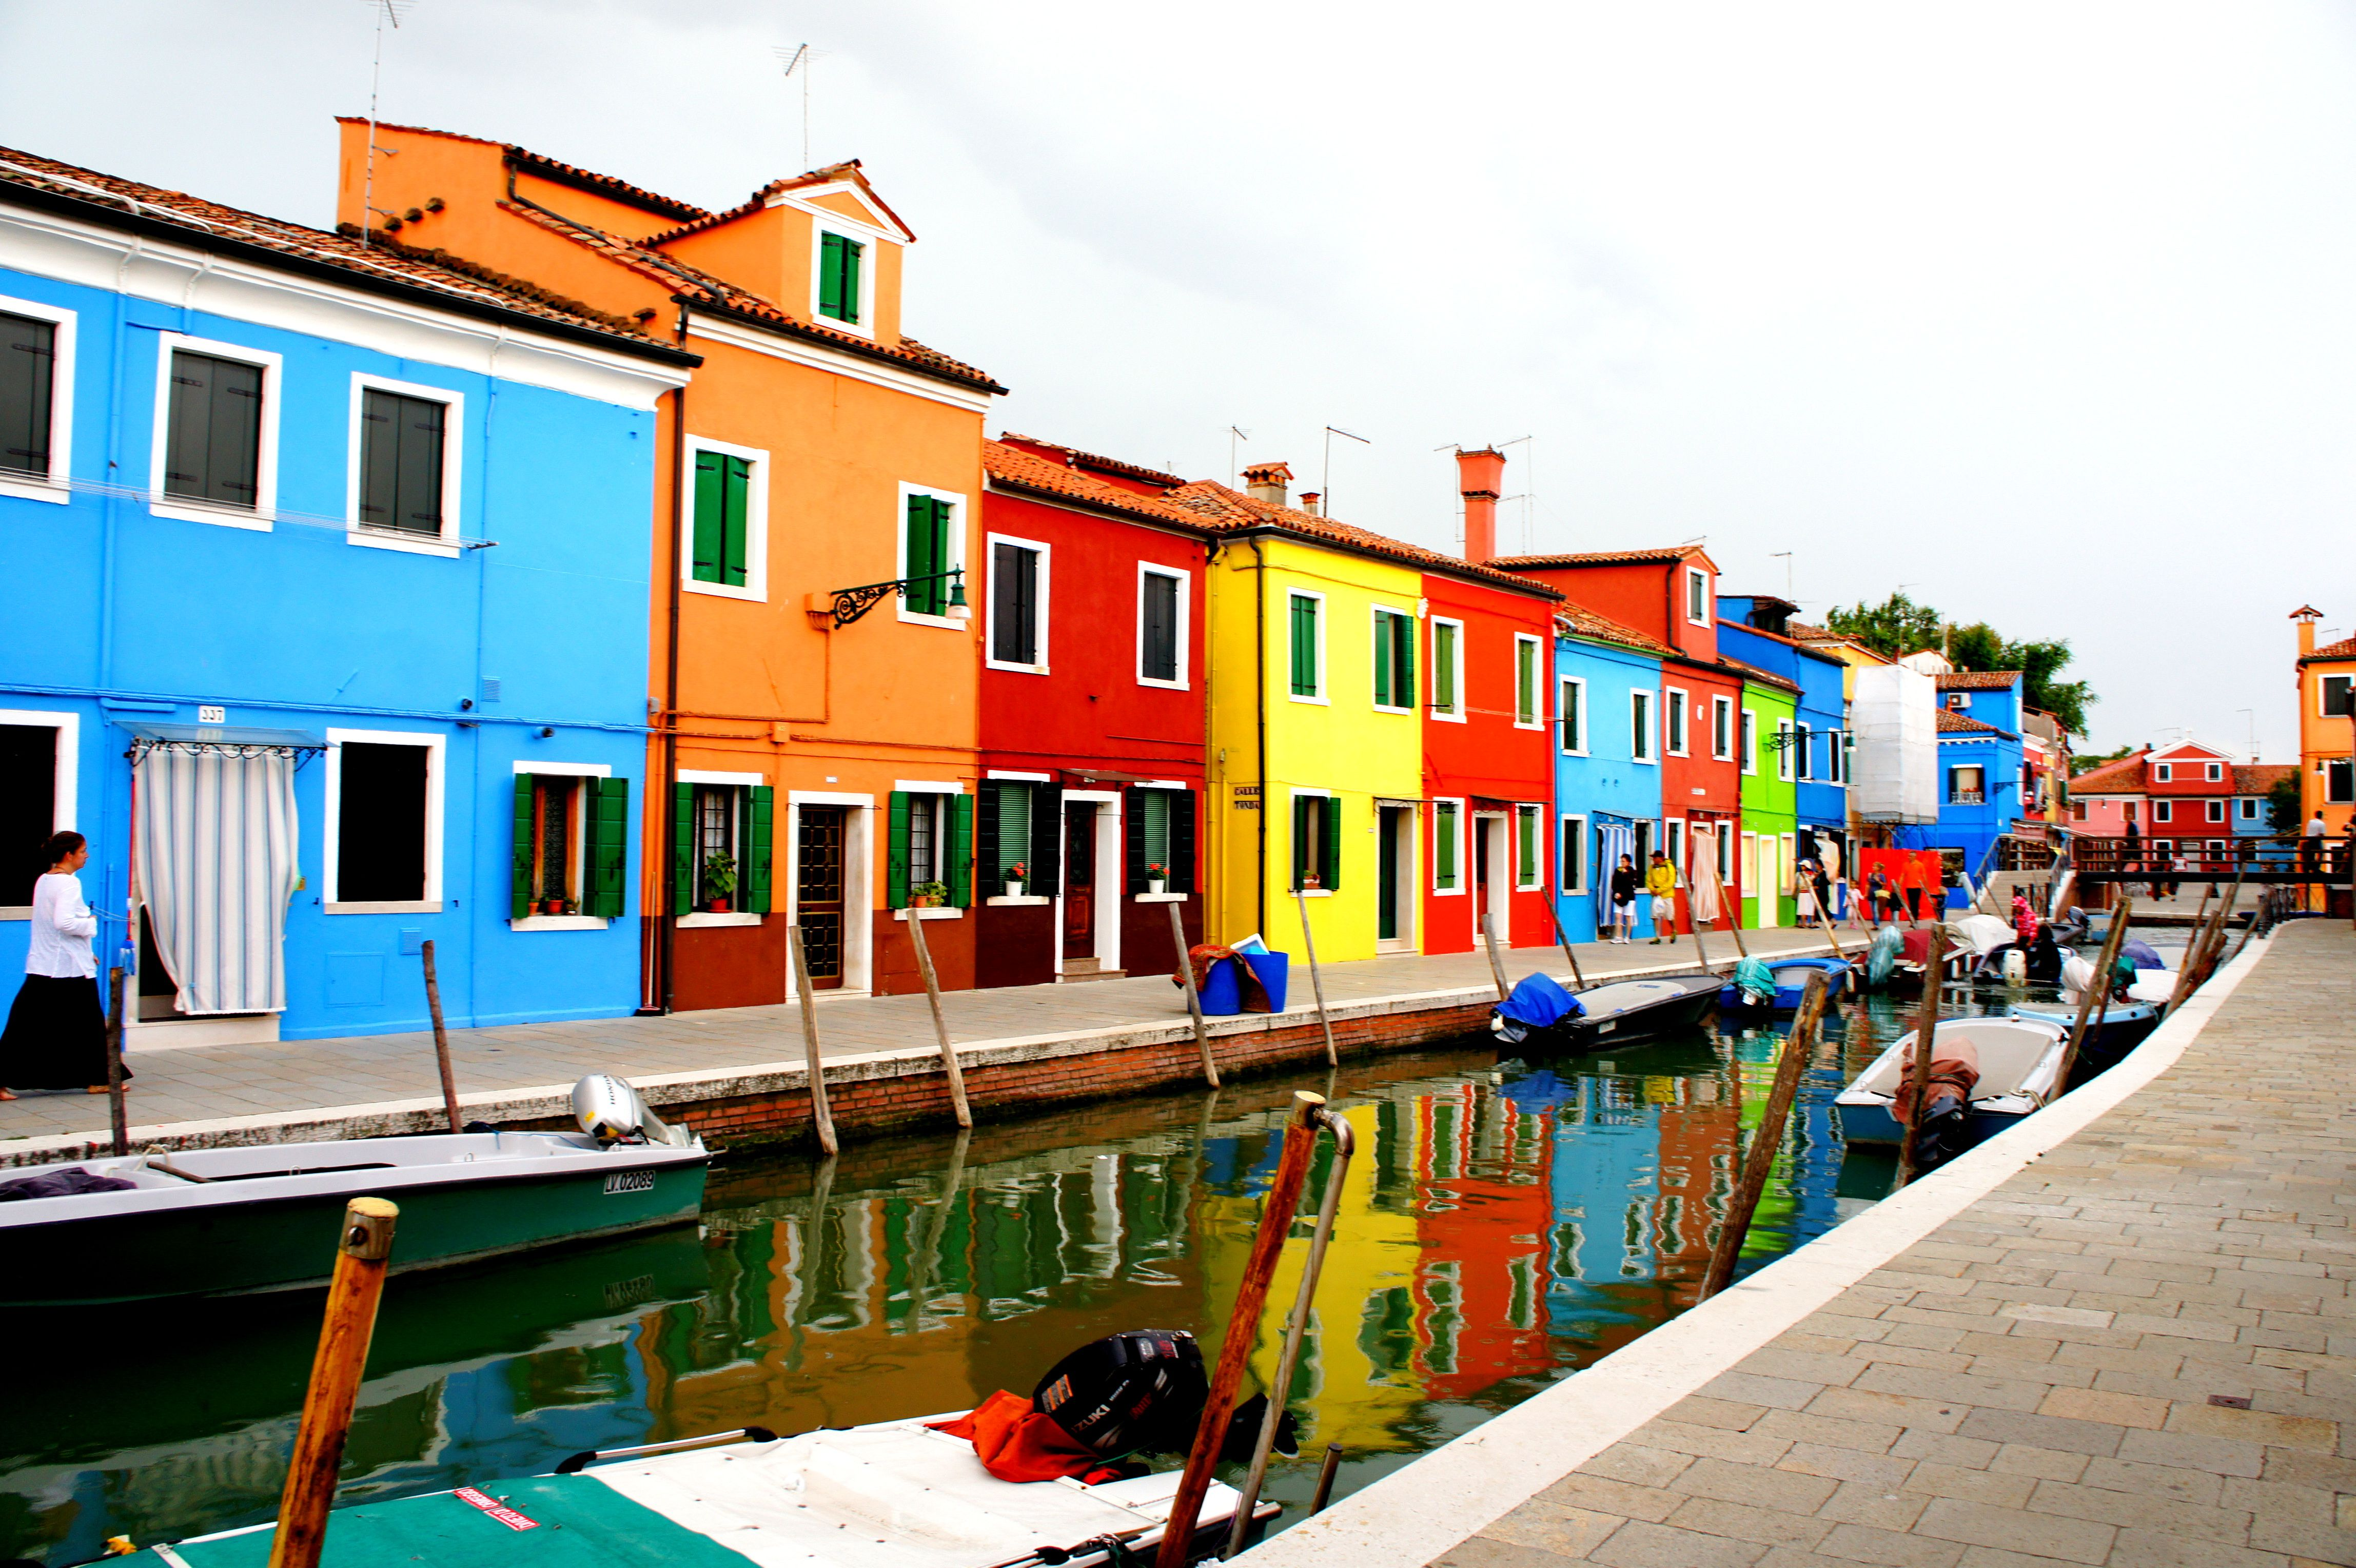 Burano, Venice, June 2012